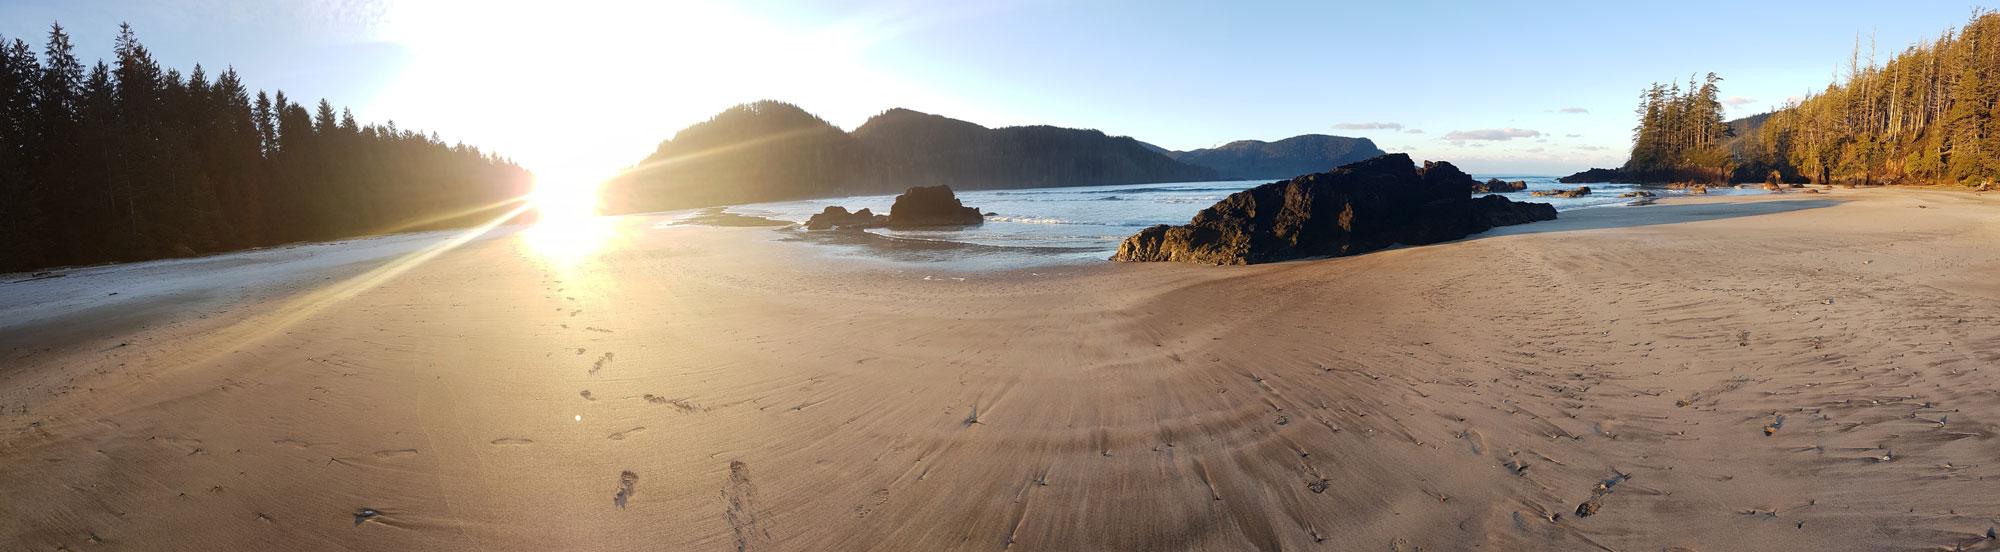 West Coast Canada beach at sunset